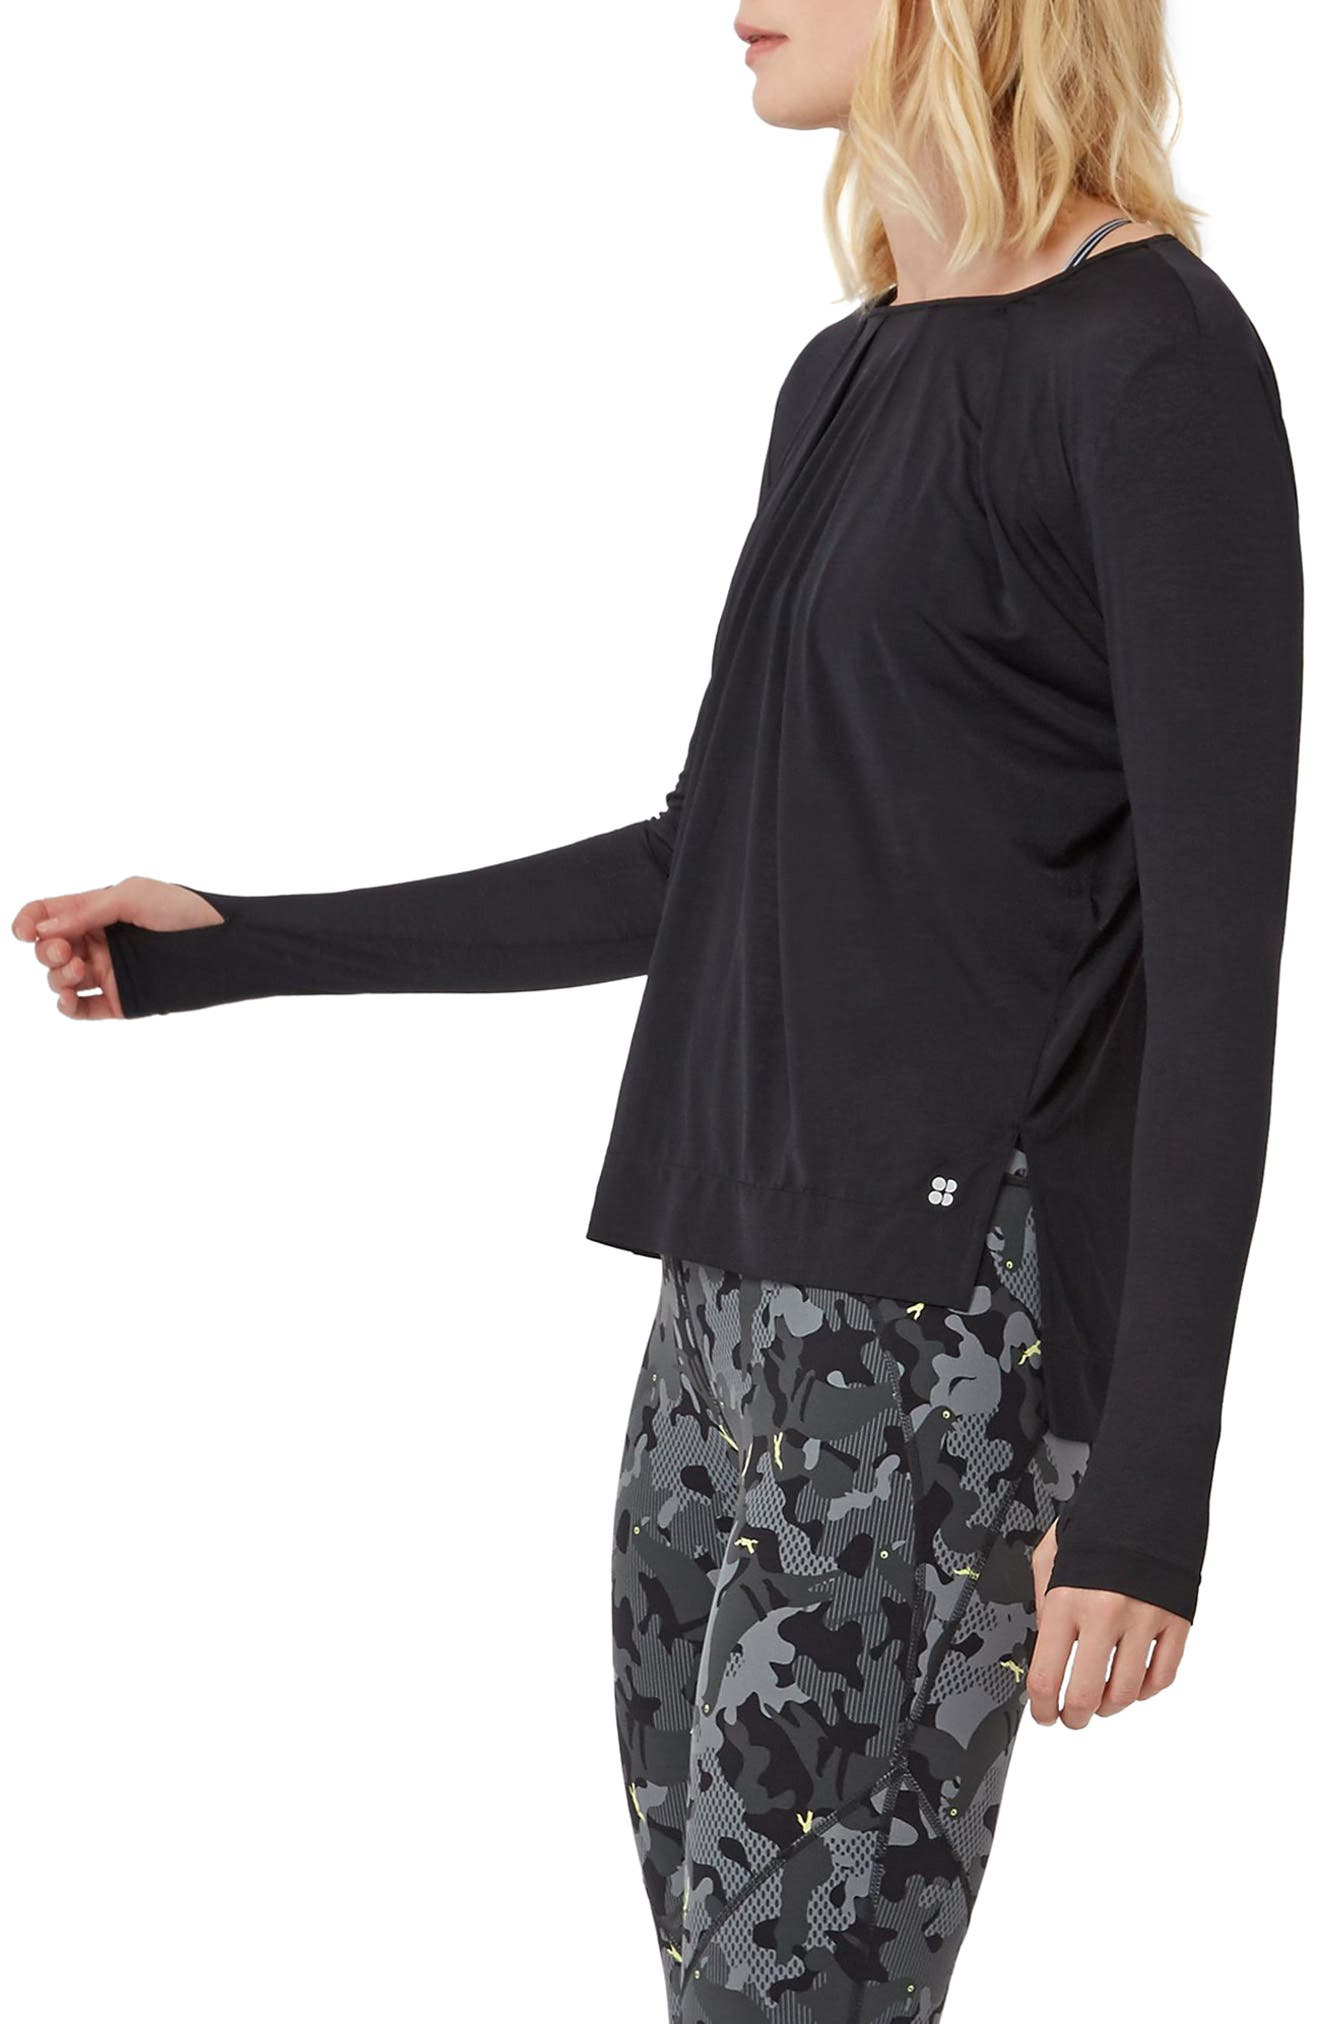 Hinoki Long Sleeve Tee,                             Alternate thumbnail 3, color,                             BLACK